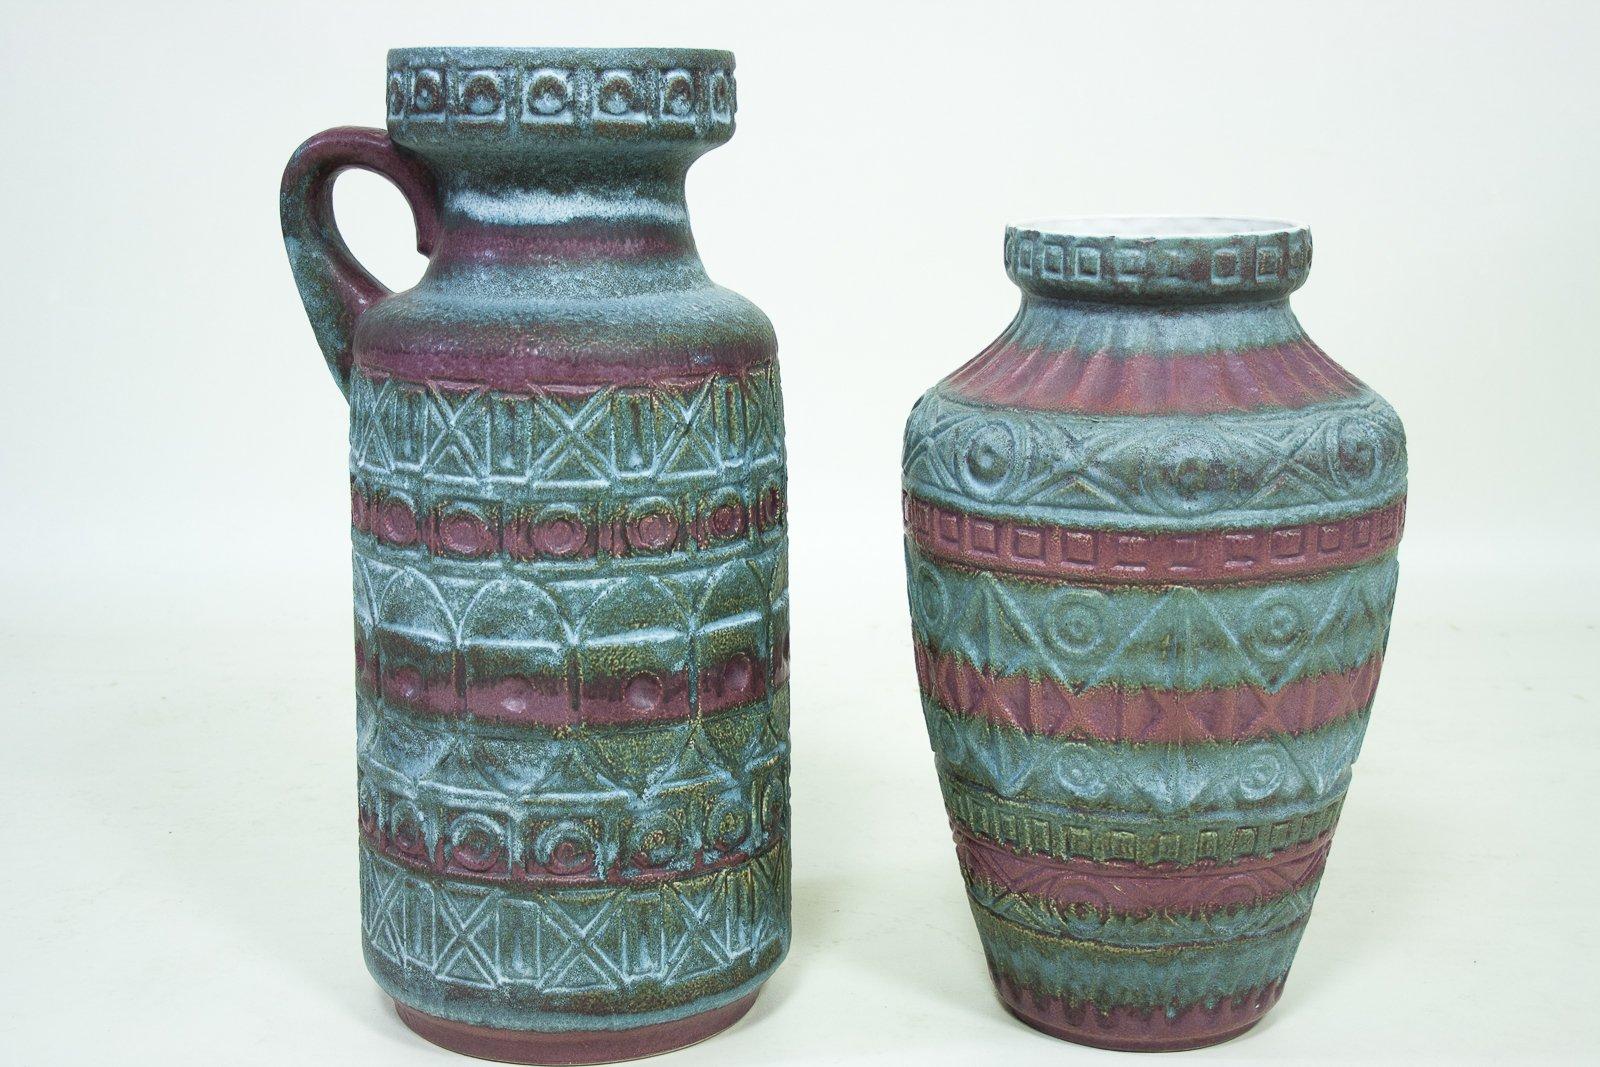 Vintage west german ceramic vases by bodo mans for bay keramik vintage west german ceramic vases by bodo mans for bay keramik set of 2 reviewsmspy